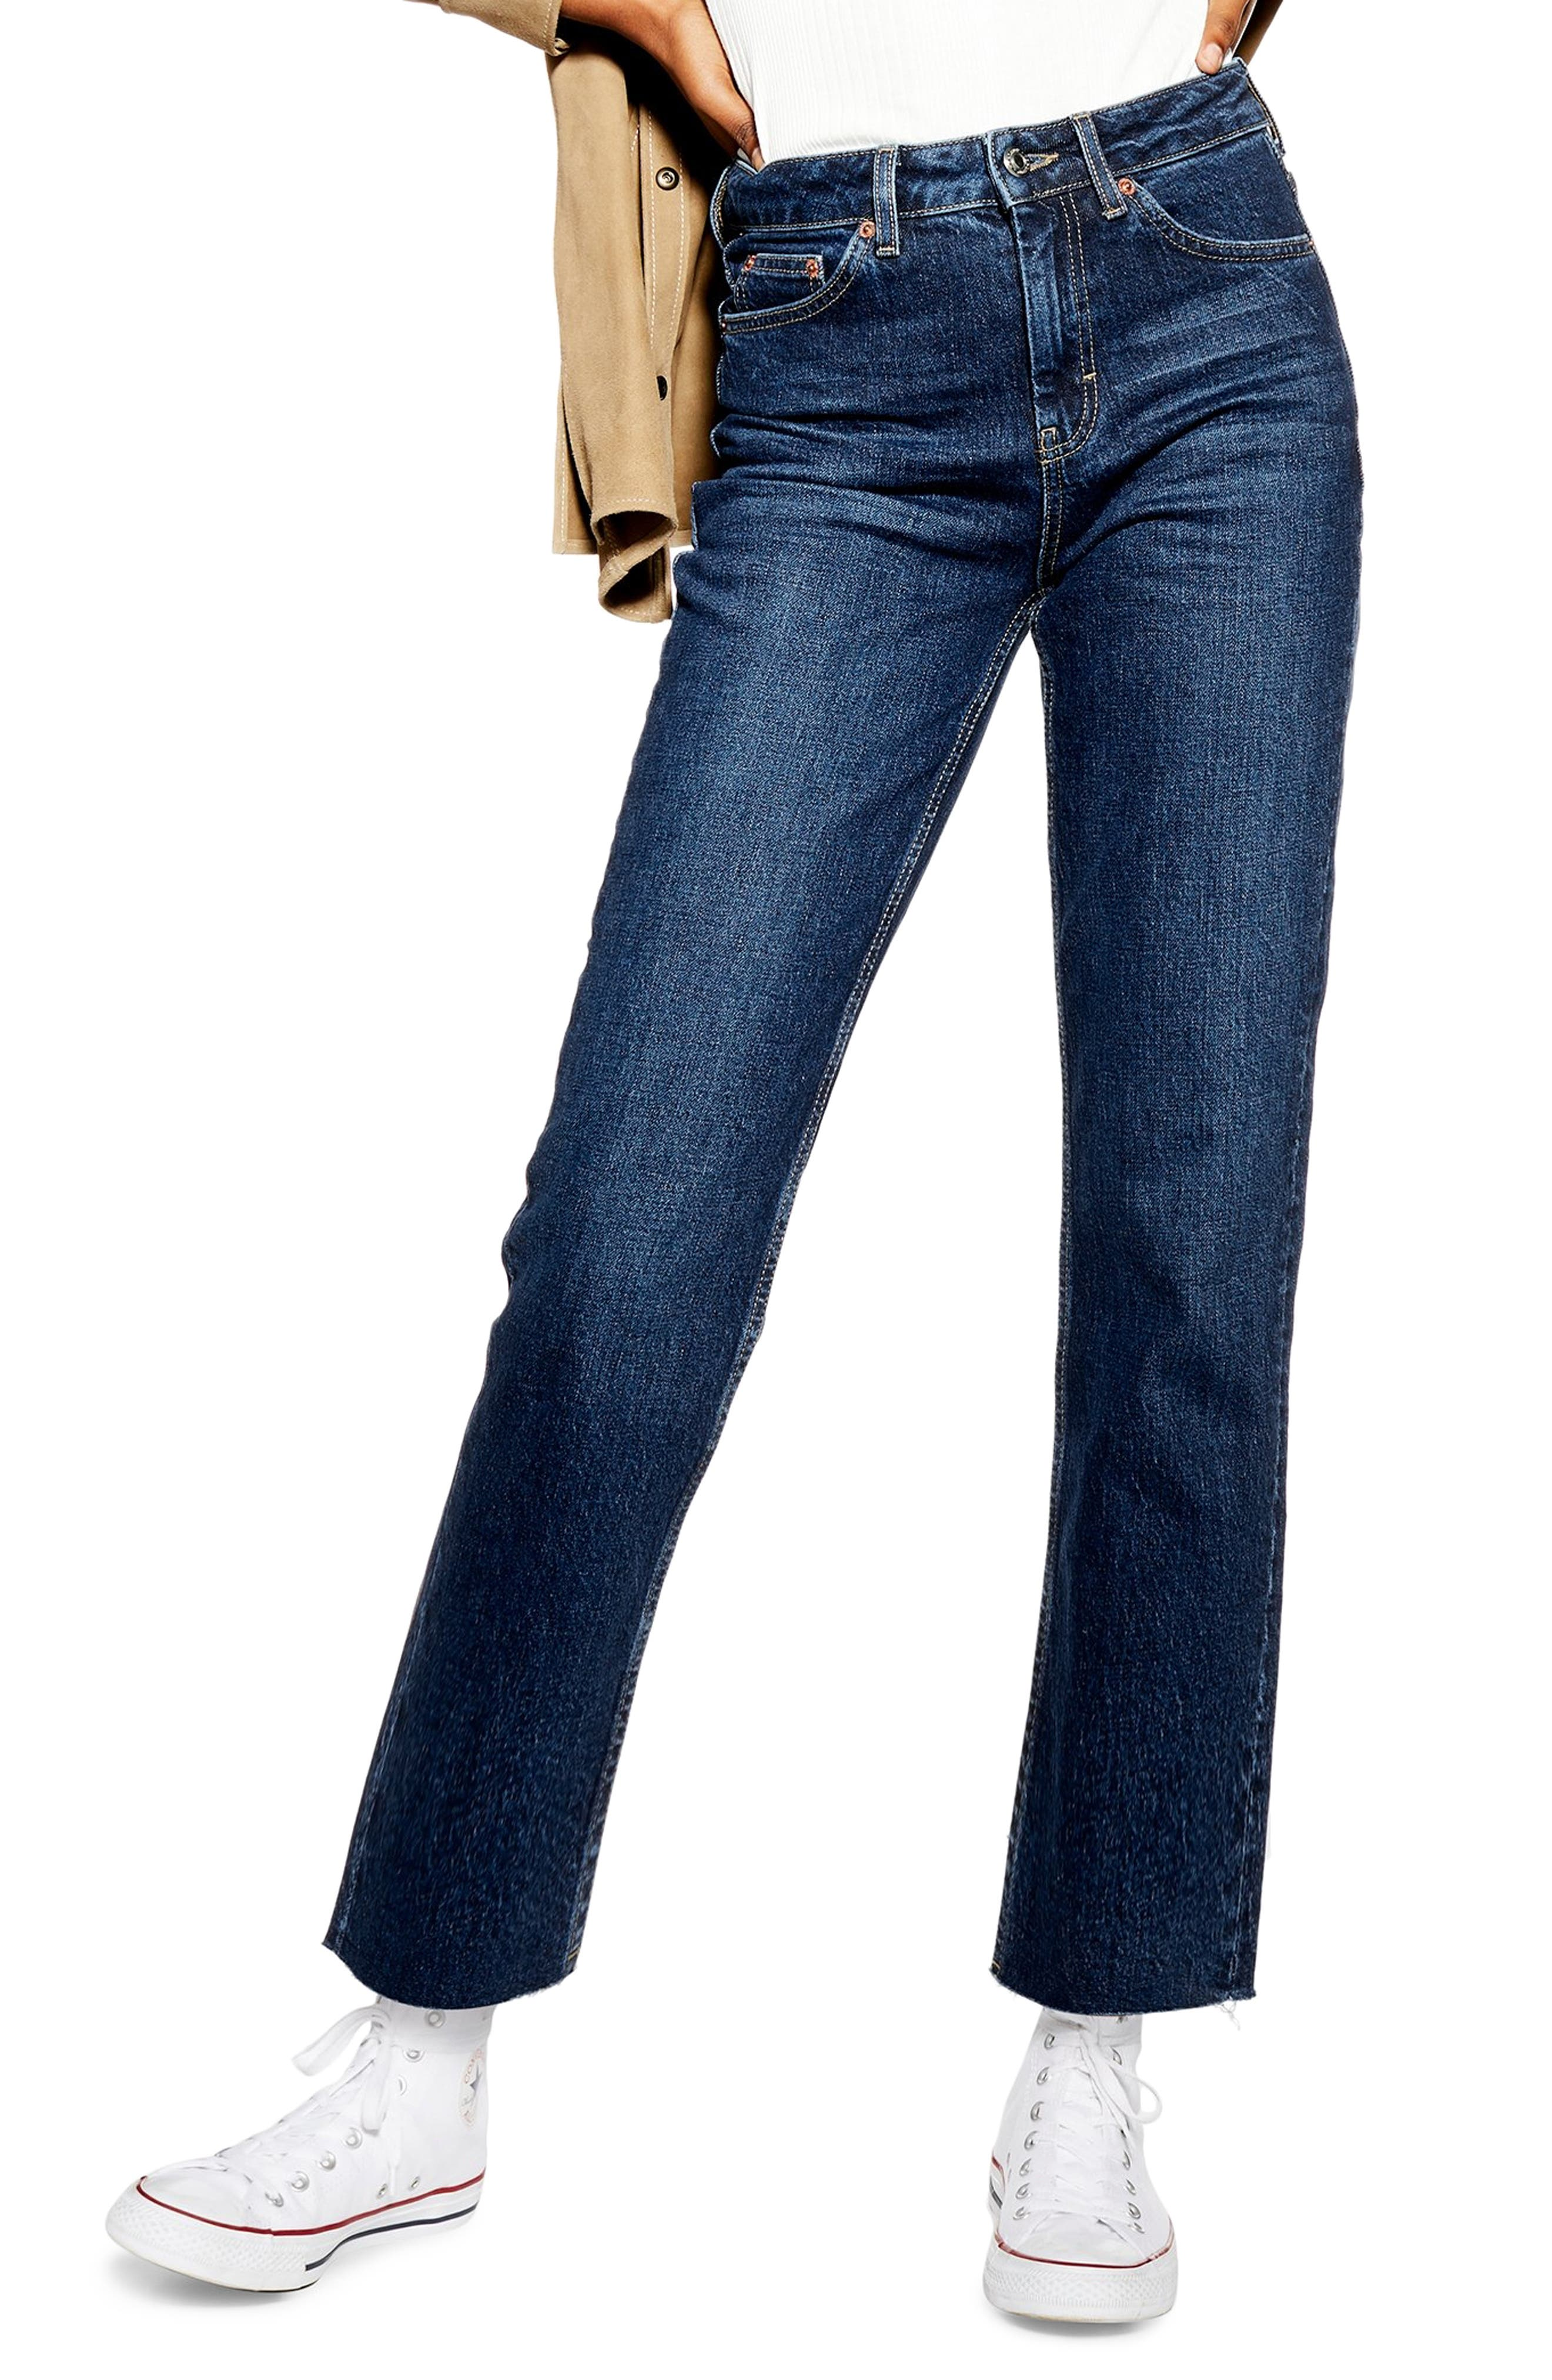 TOPSHOP, Raw Hem Straight Leg Jeans, Main thumbnail 1, color, INDIGO